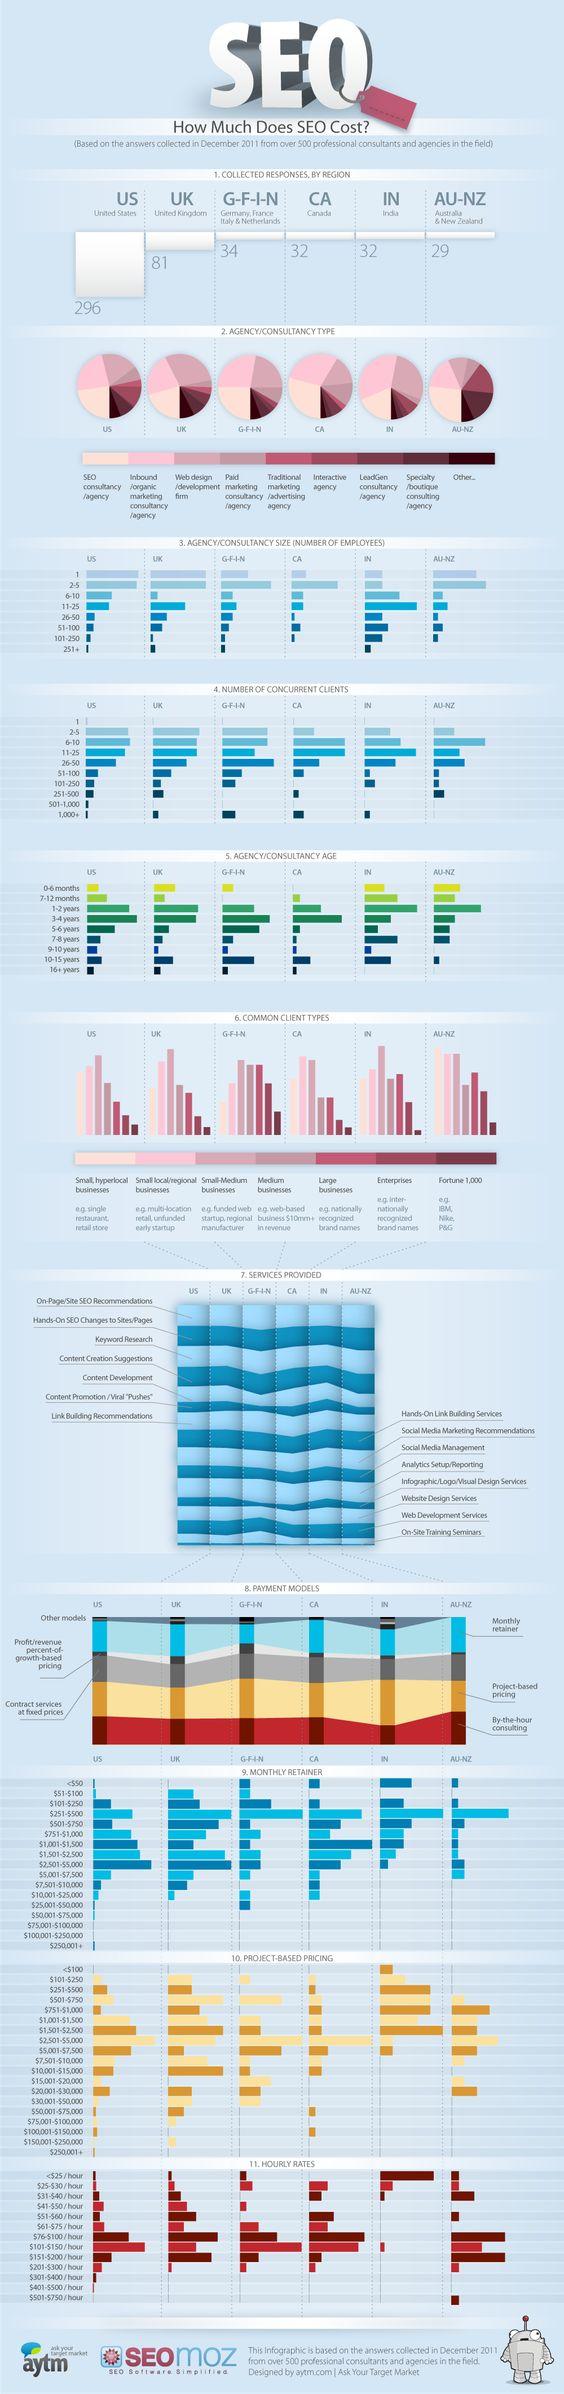 The price of SEO: infographic | Econsultancy